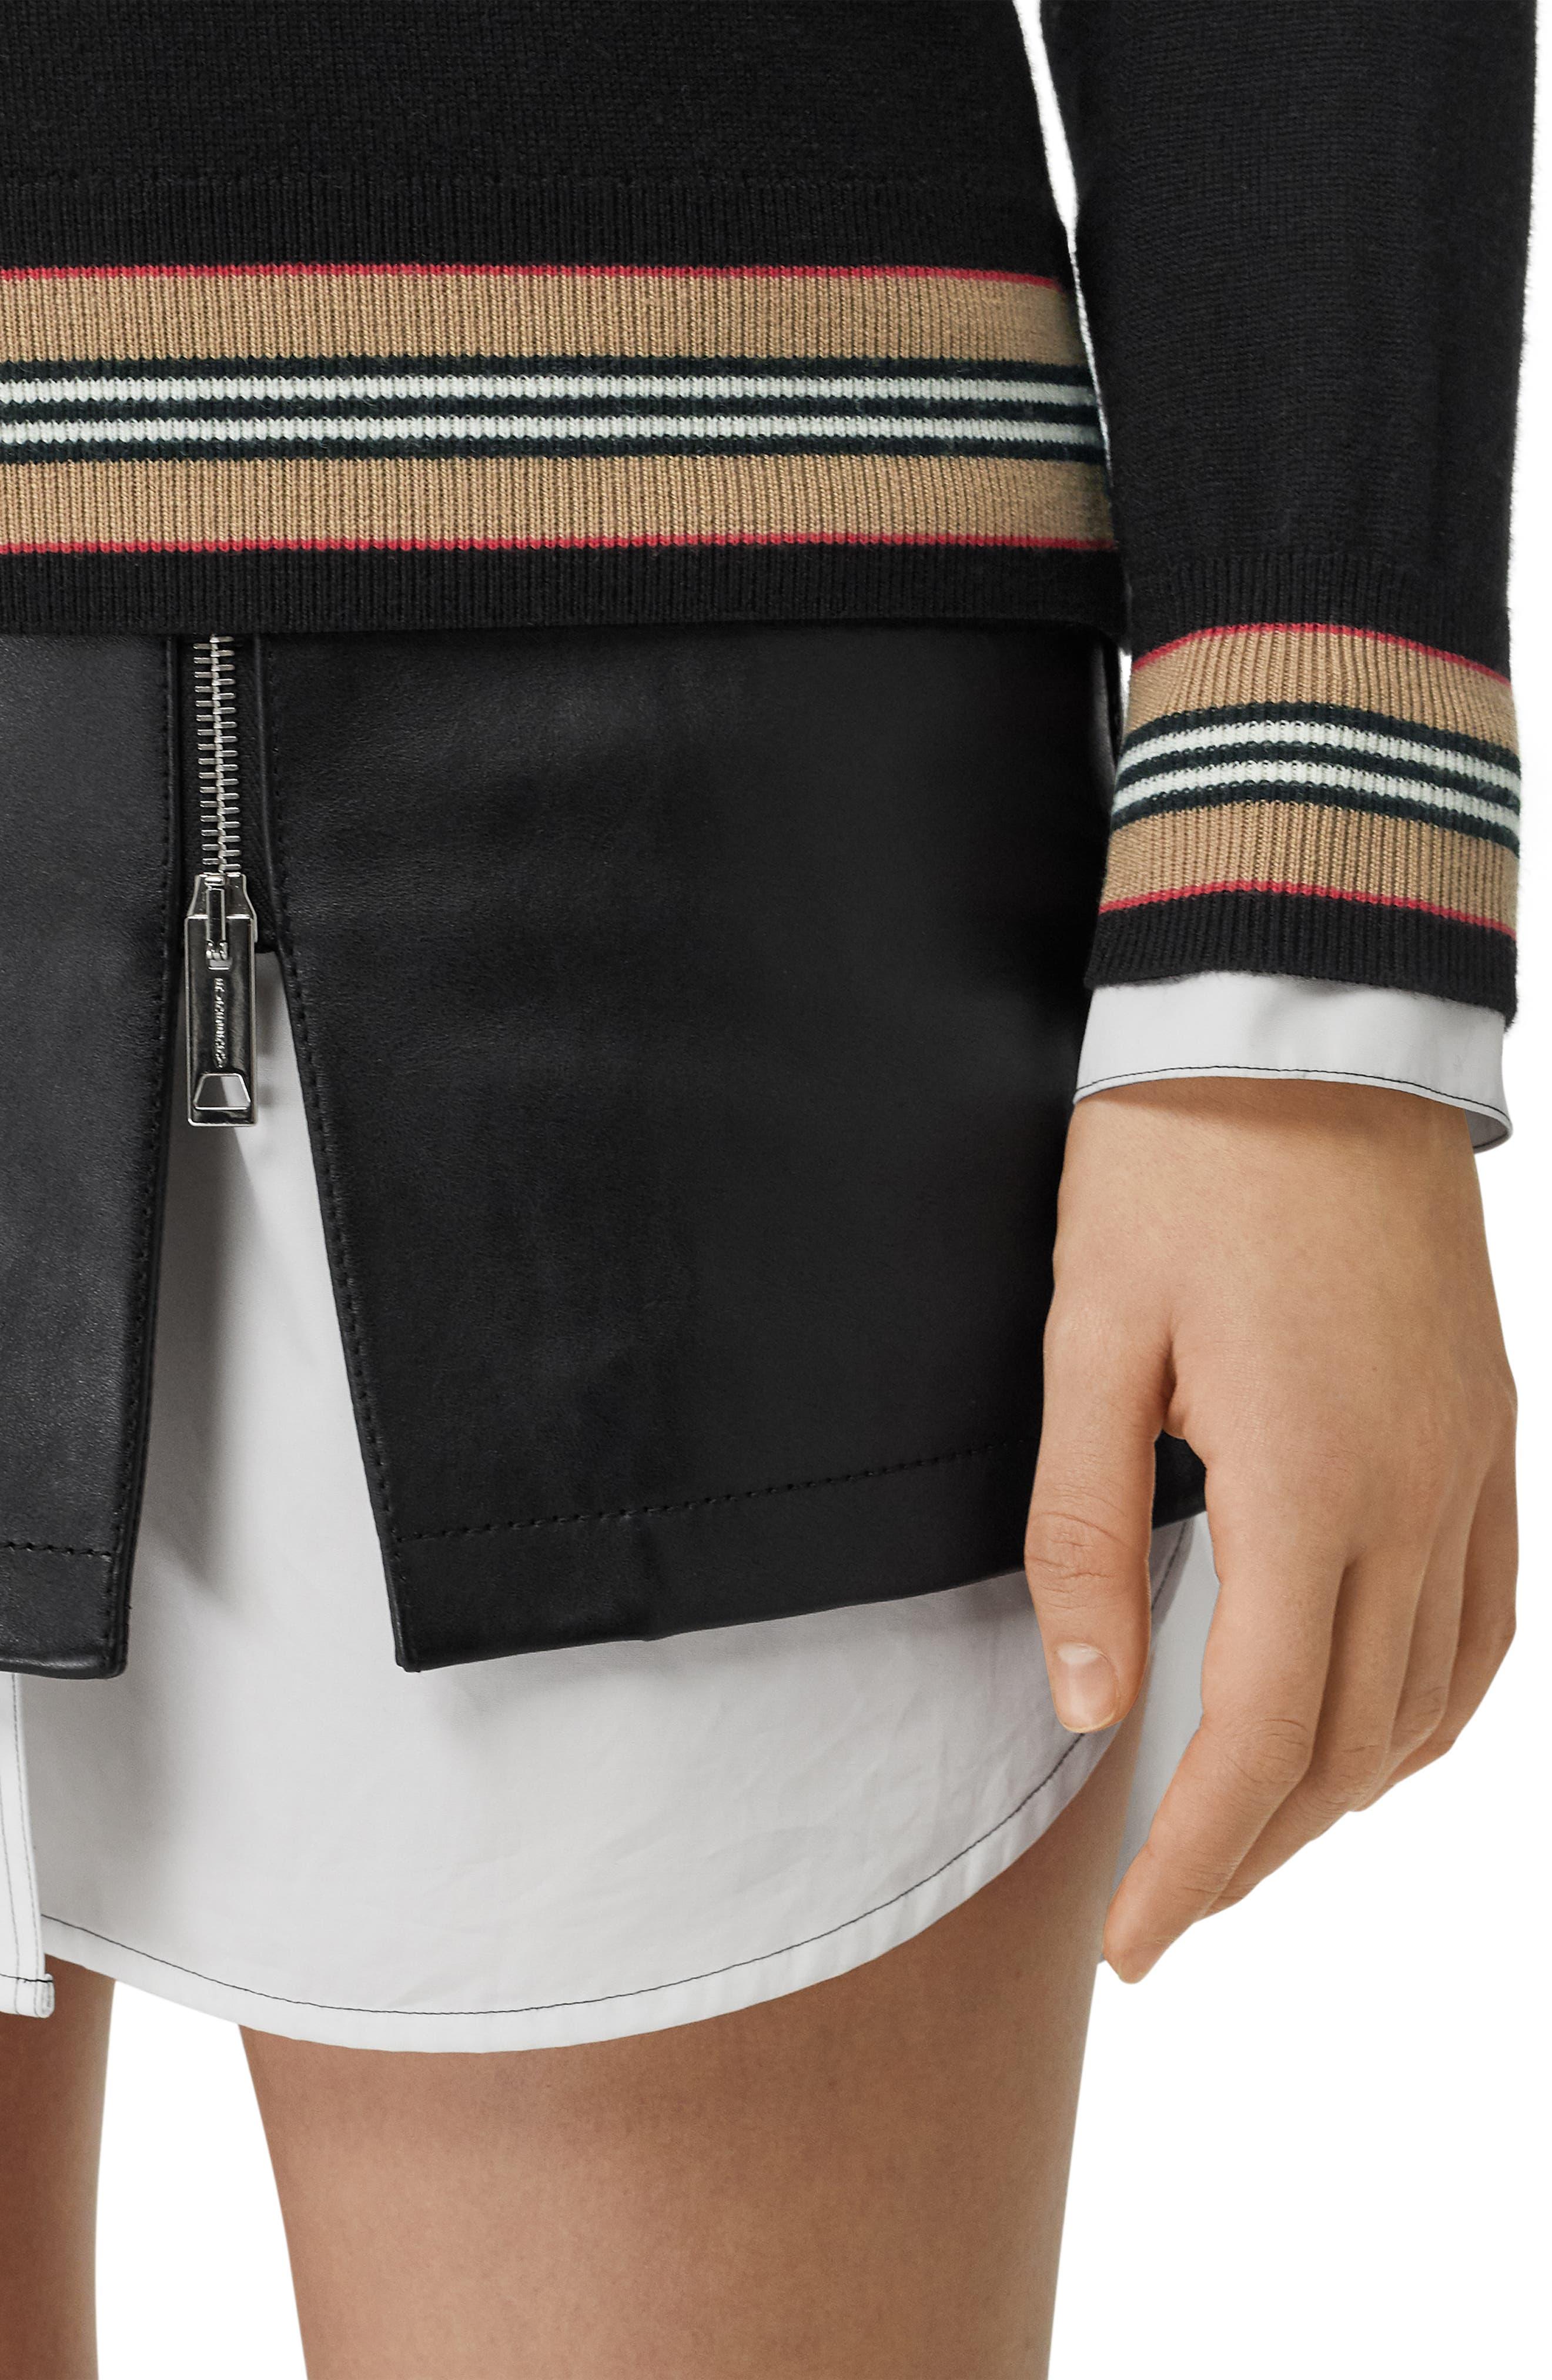 BURBERRY, Stripe Trim Merino Wool Sweater, Alternate thumbnail 3, color, BLACK